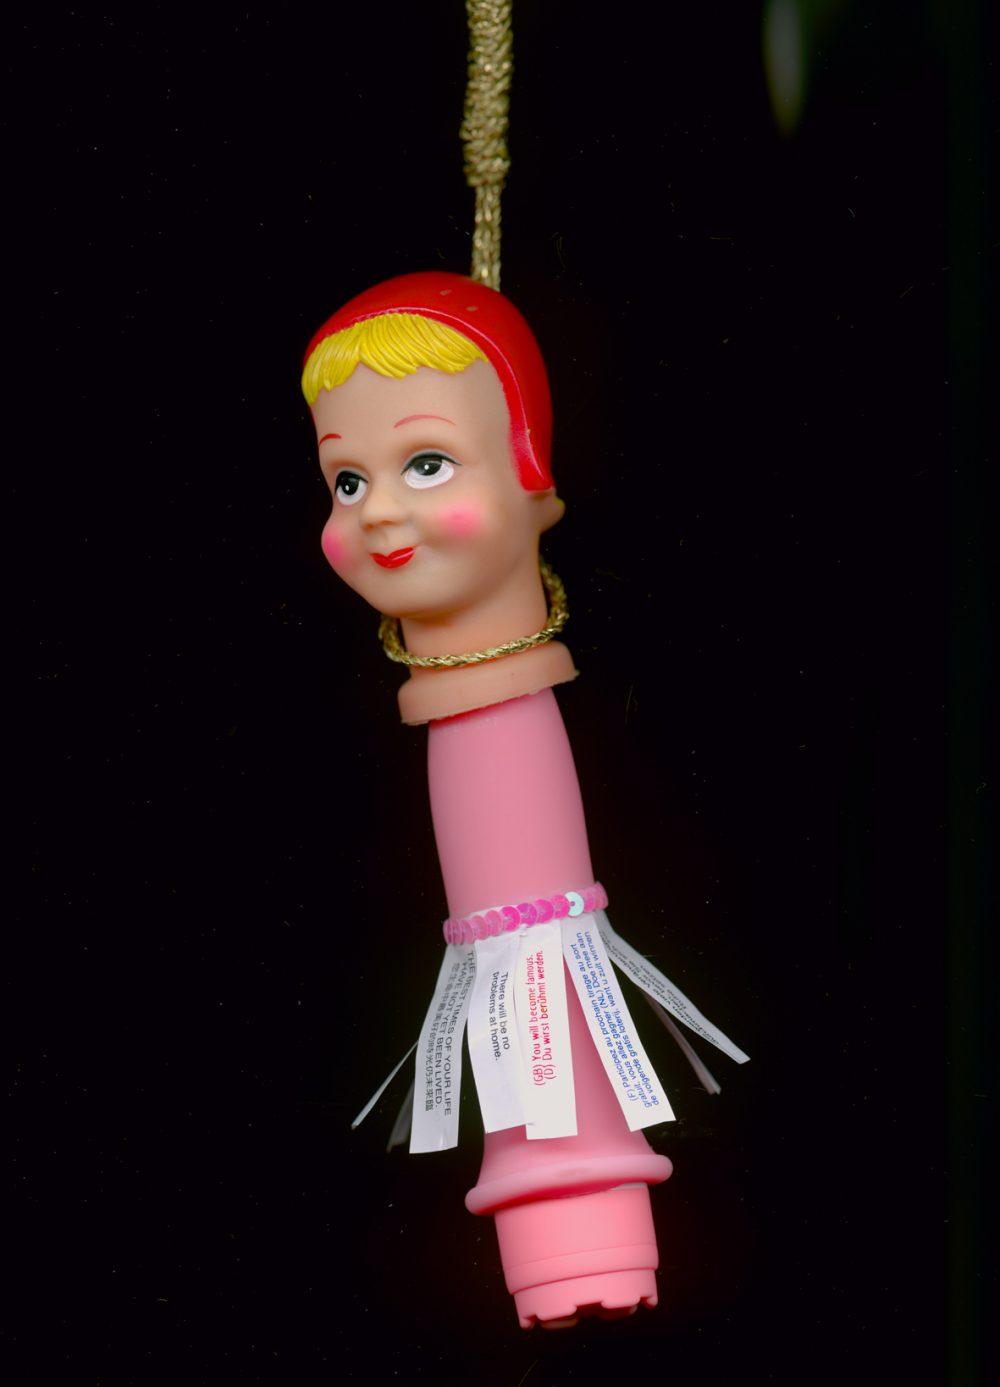 Worry Dolls: Fuck Head (2010), Archival ink auf Fotopapier, 60 x 40 cm, Ed. 5